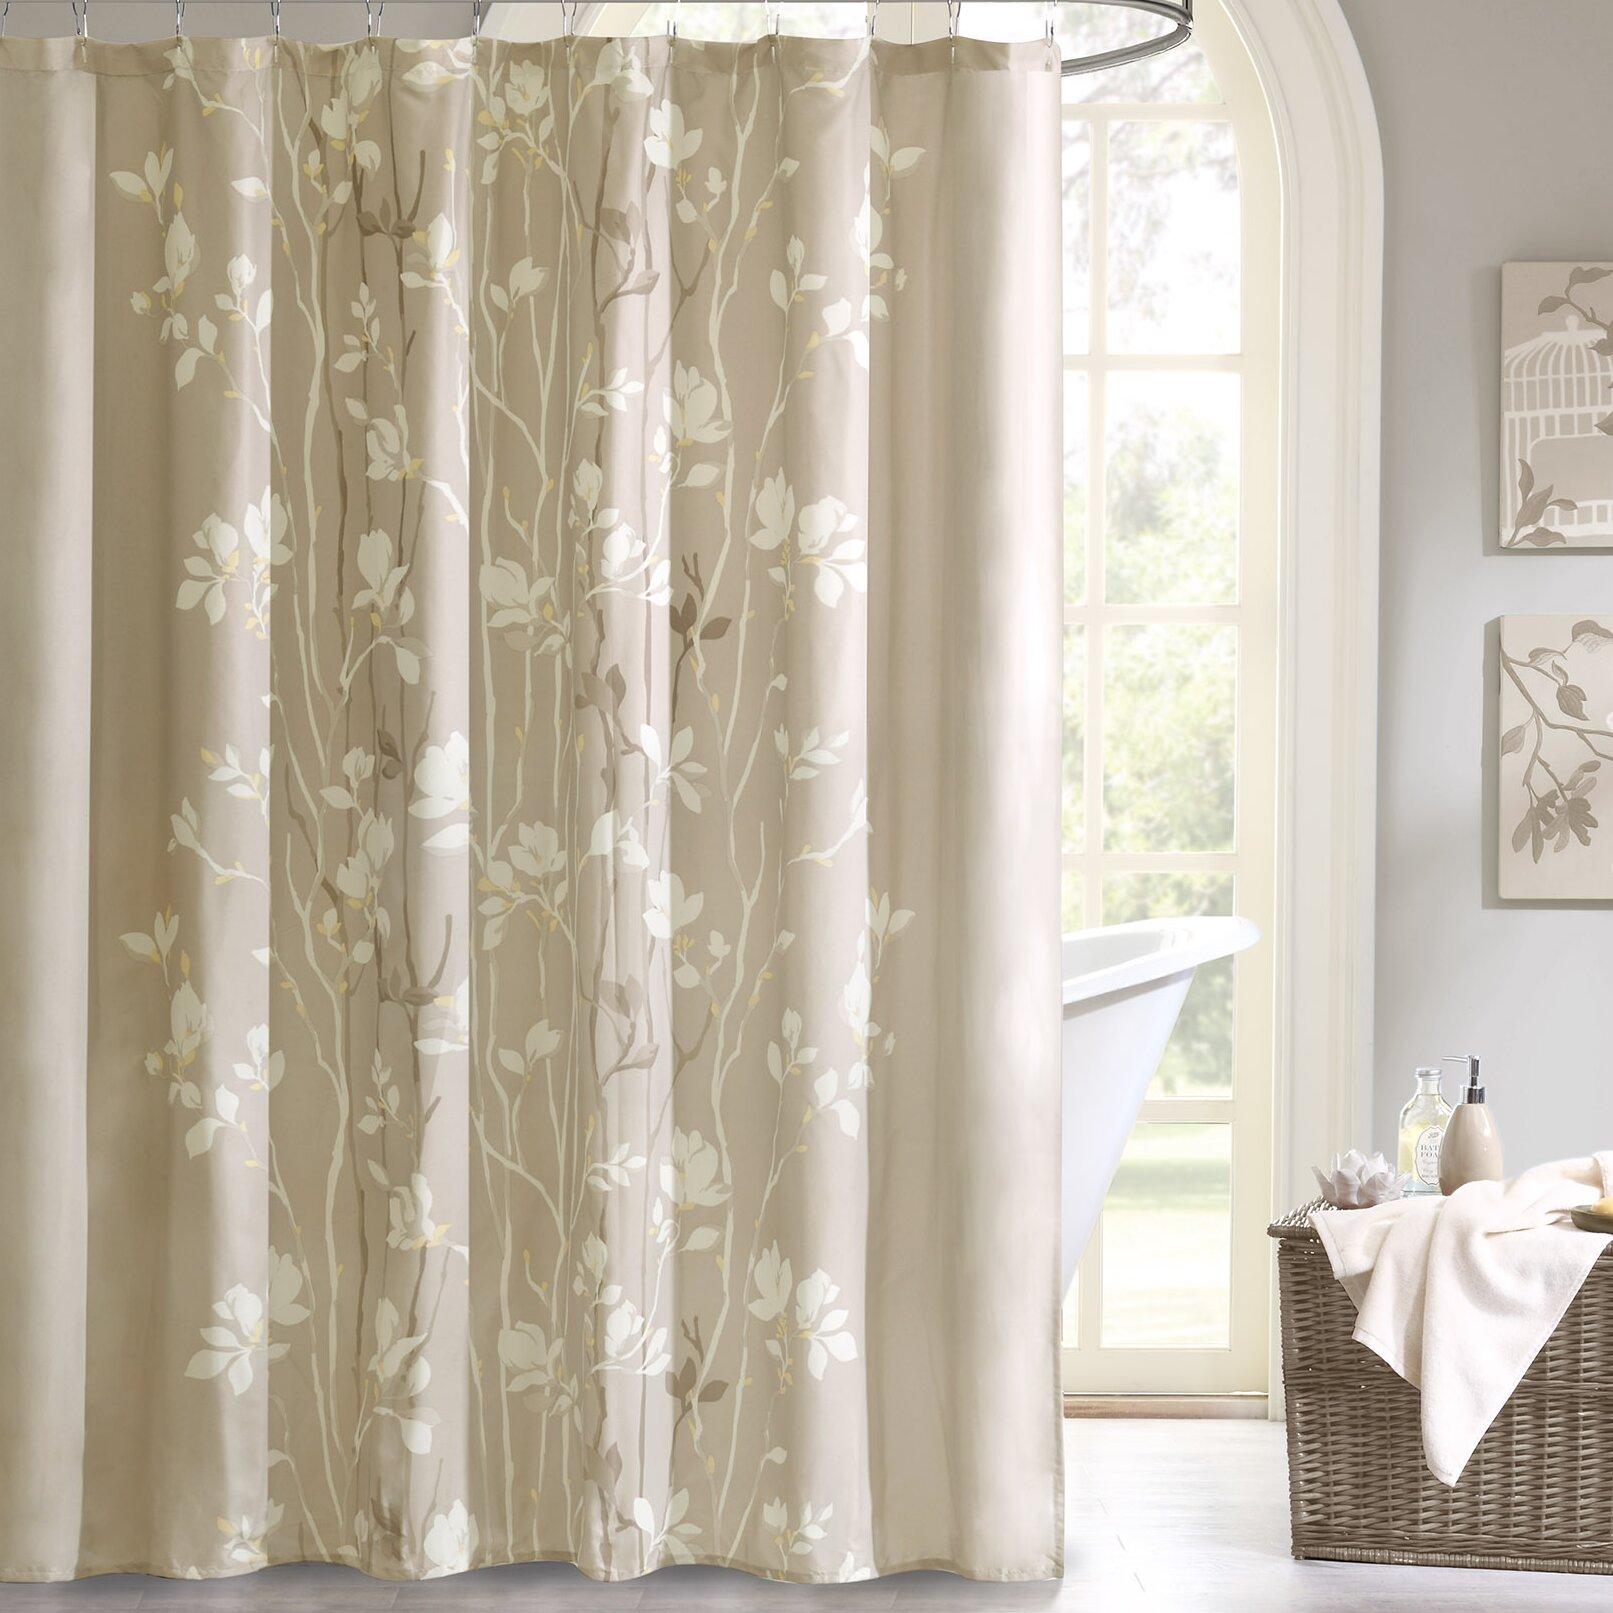 Bamboo shower curtain - Vaughn Shower Curtain